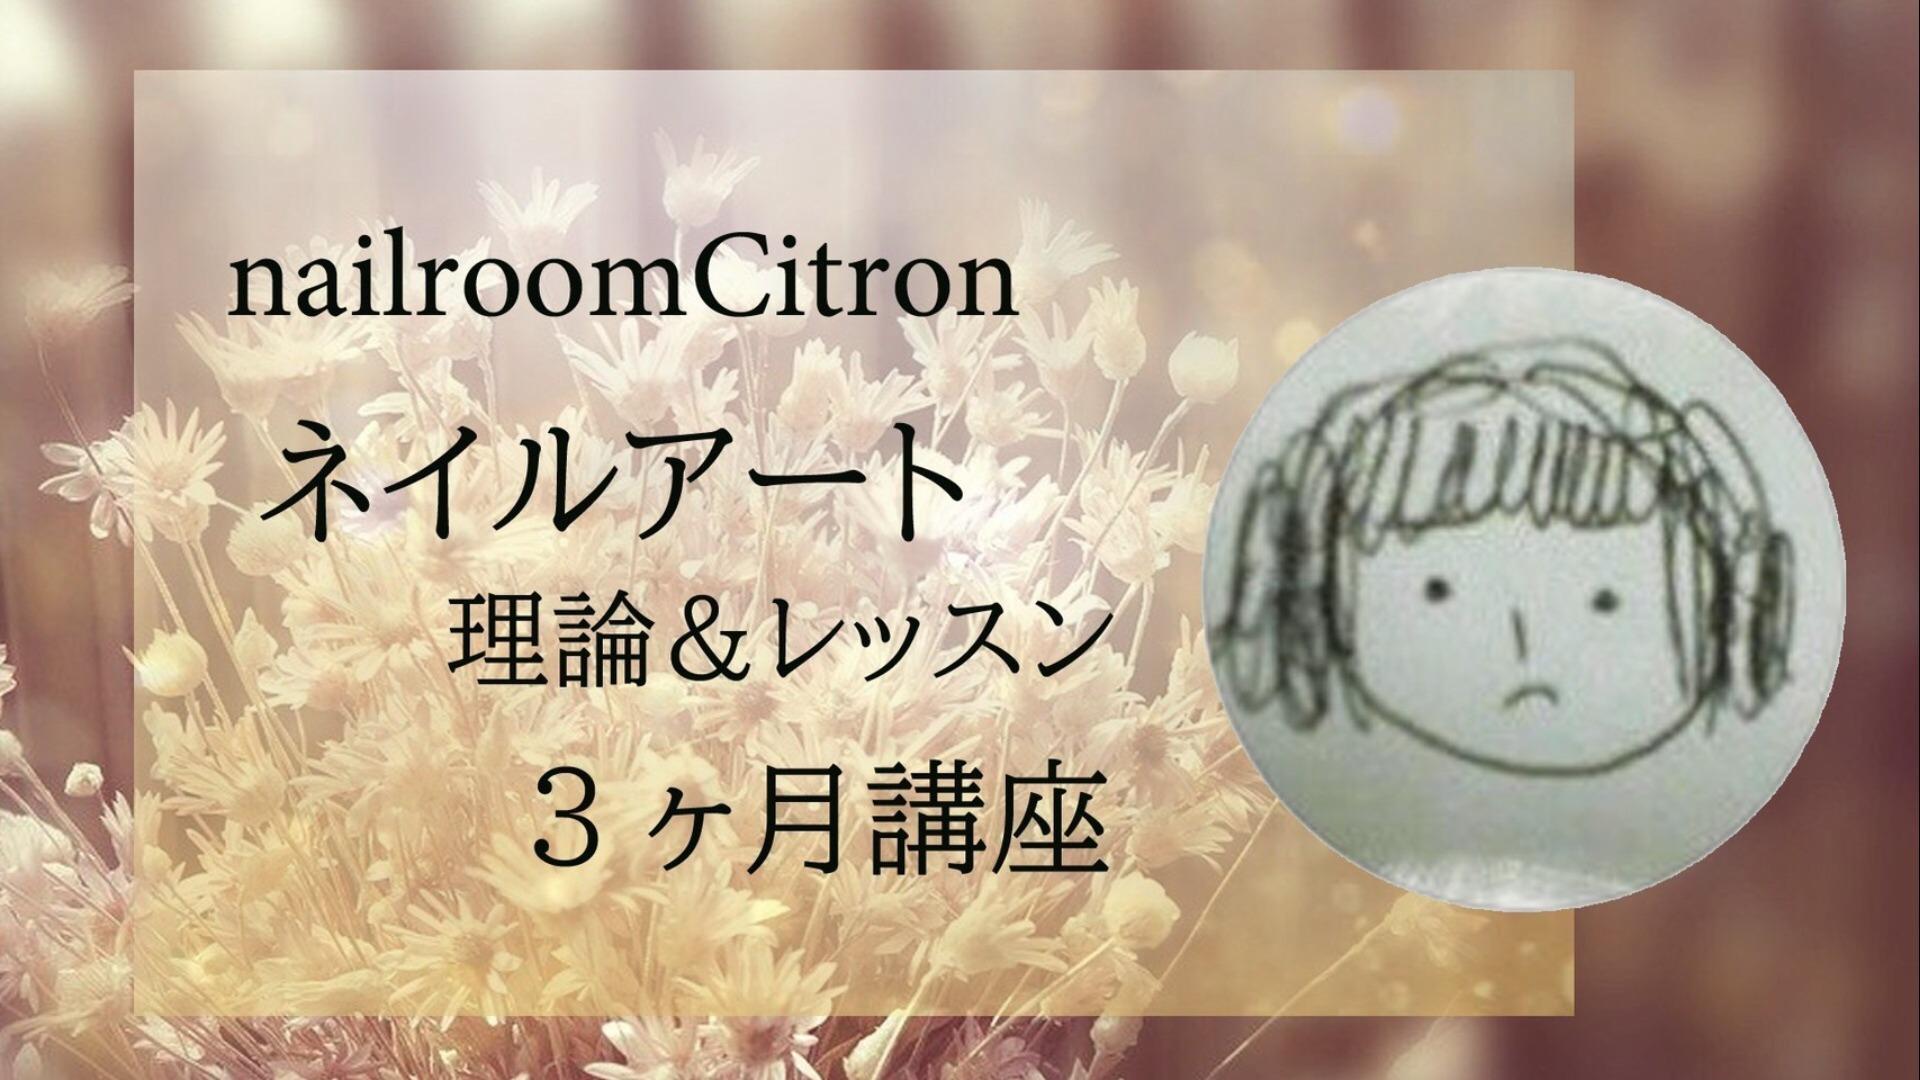 nailroomCitron ネイルアート理論&レッスン 3ヶ月講座